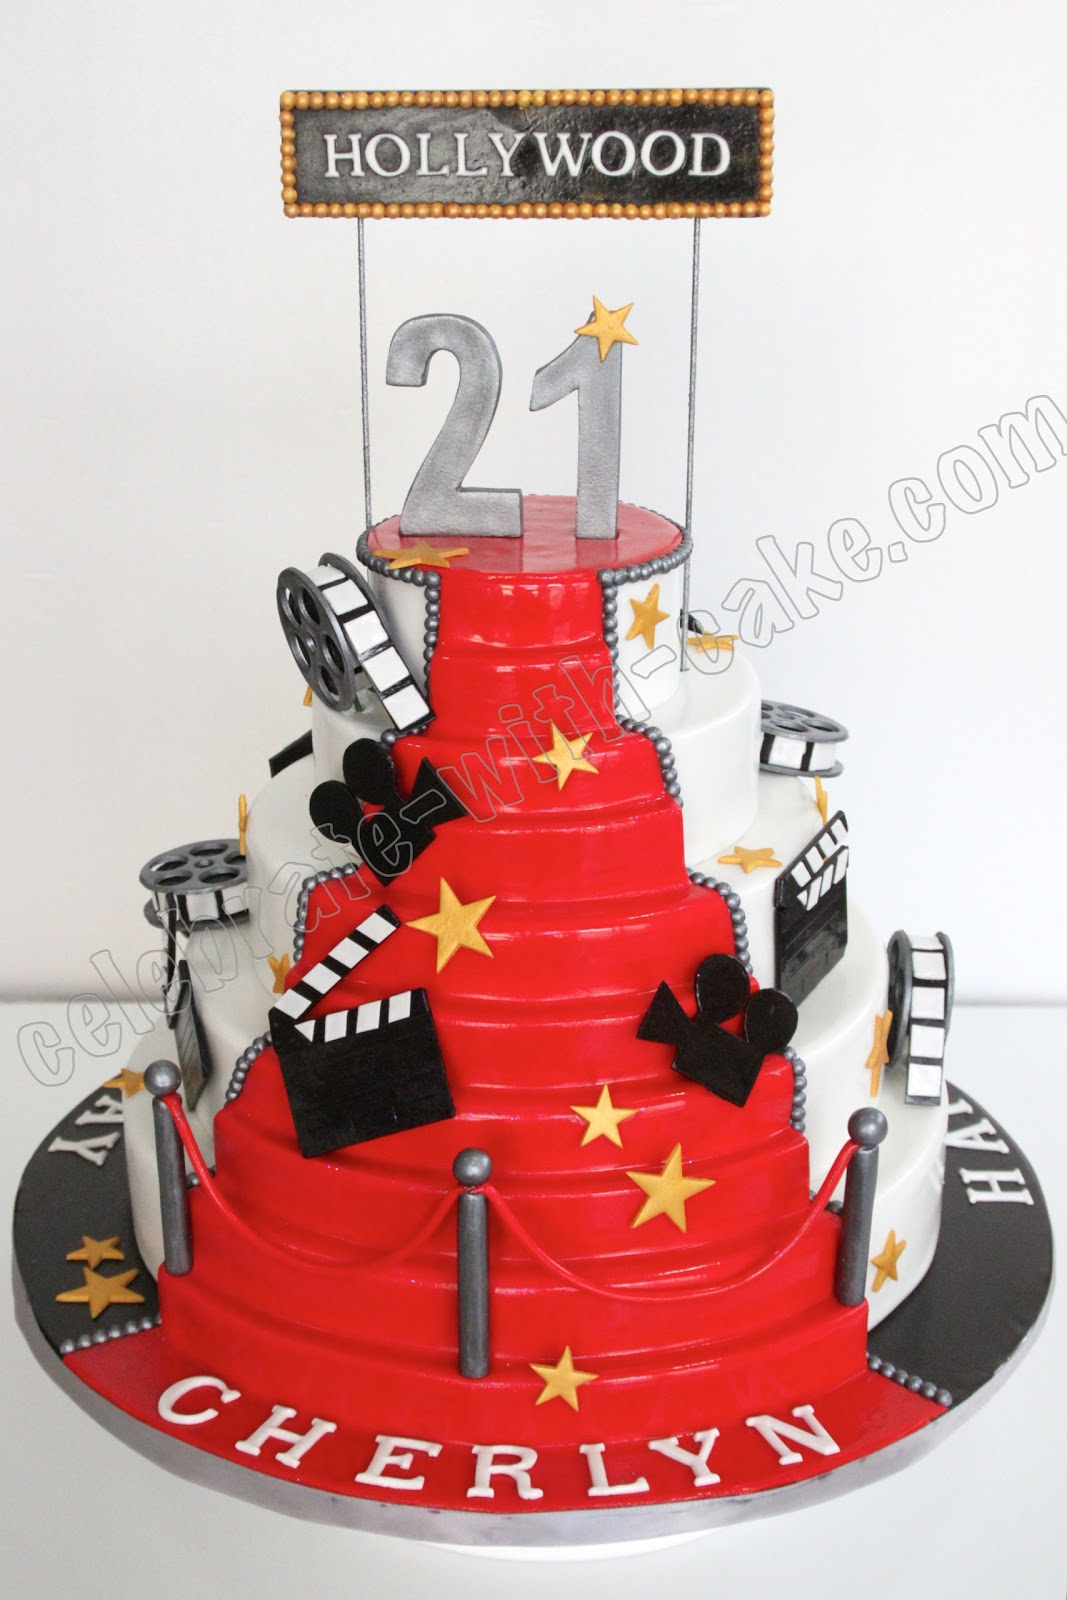 Pleasing 13 Hollywood Birthday Cakes Photo Hollywood Themed Cake Funny Birthday Cards Online Elaedamsfinfo